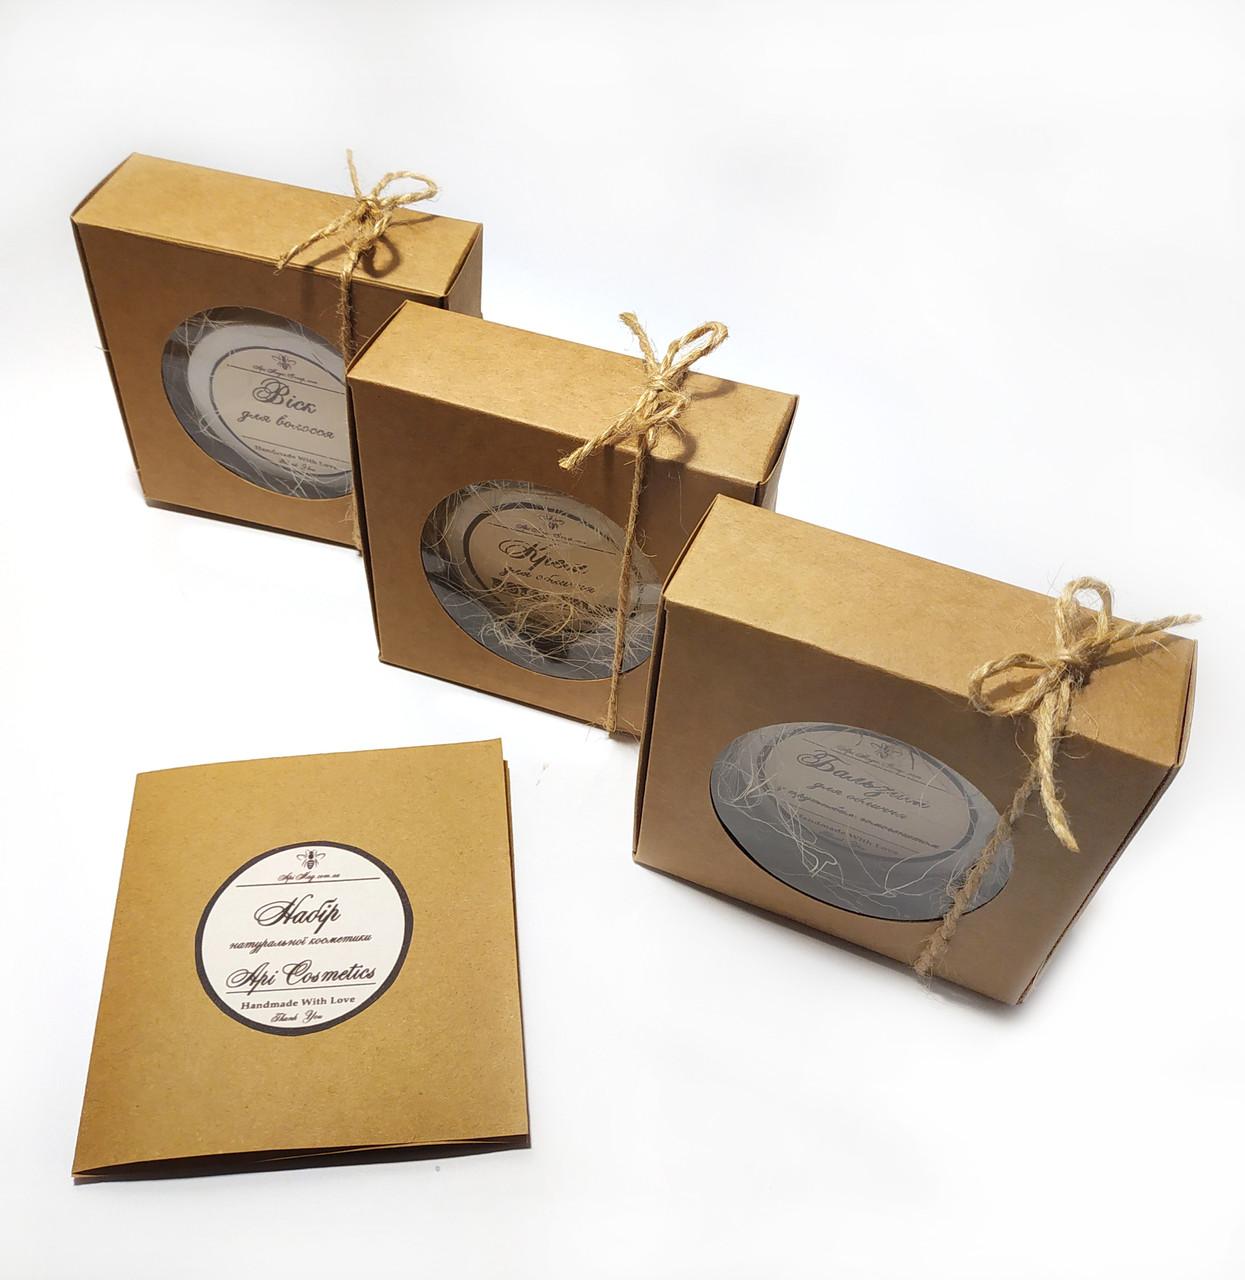 Набір натуральної косметики (апикосметики) «Крафт» крем для обличчя, бальзам для обличчя і віск для волосся